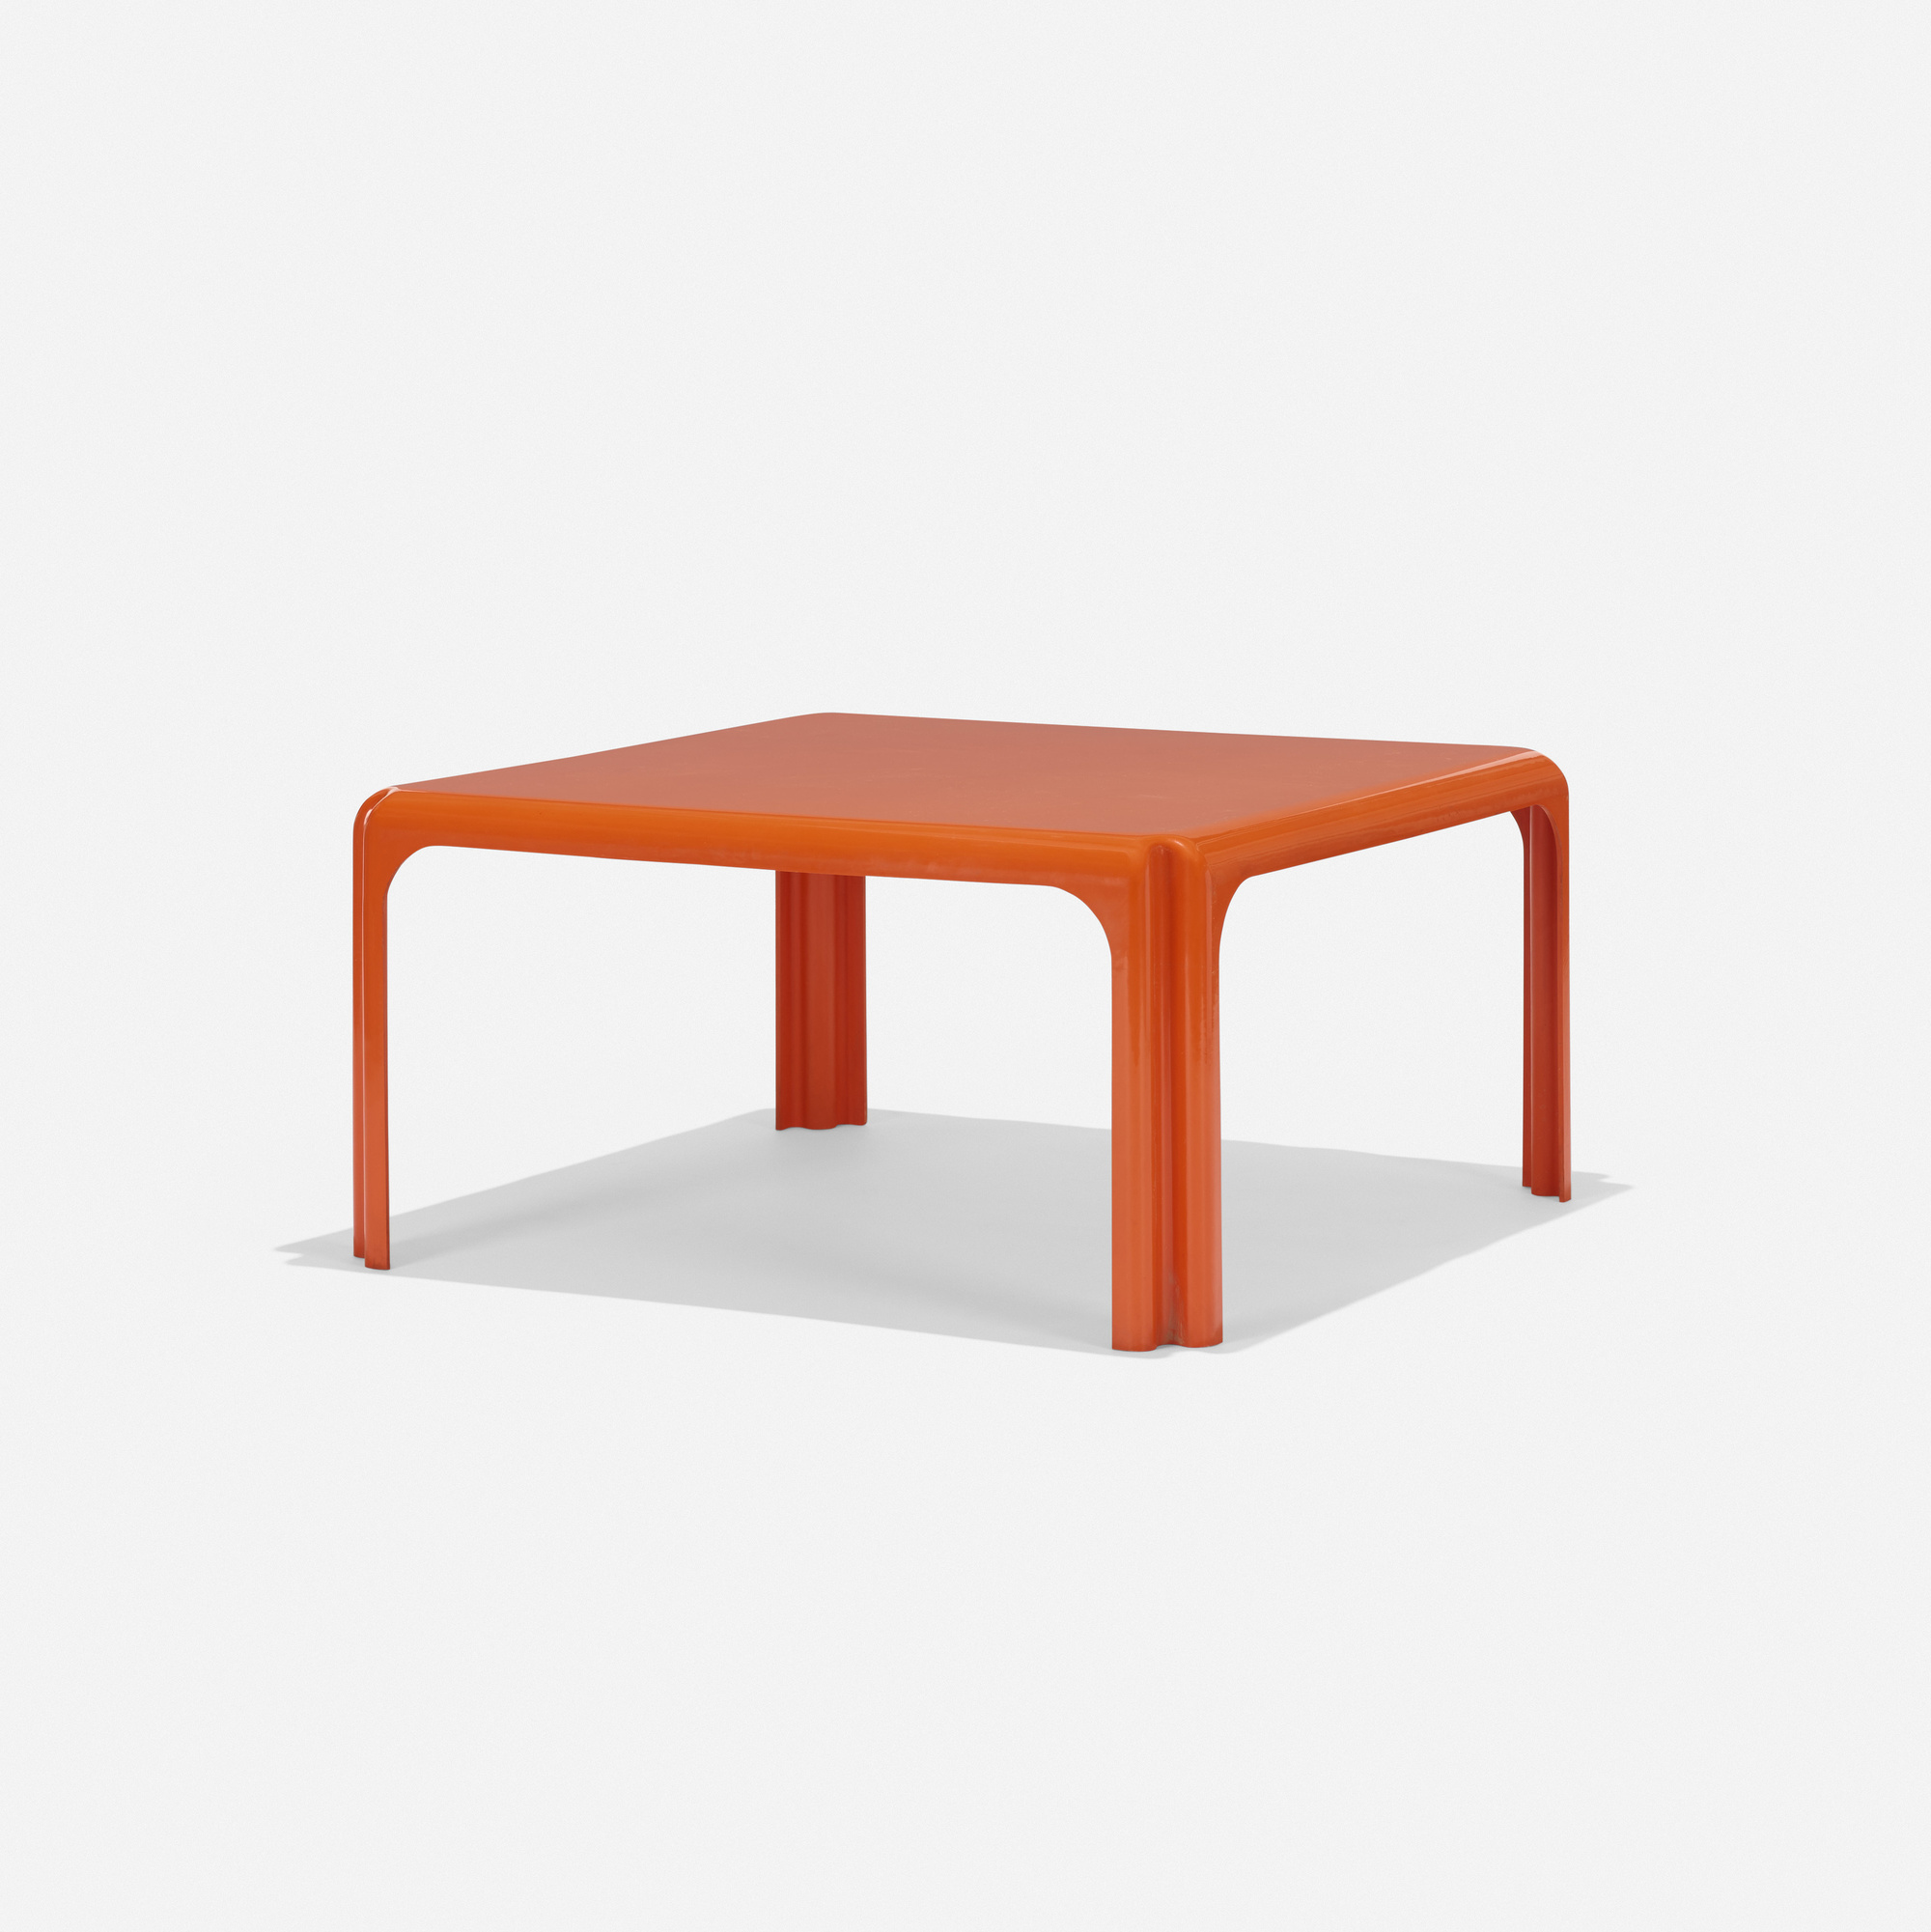 329: Vico Magistretti / Arcadia 80 coffee table (1 of 2)